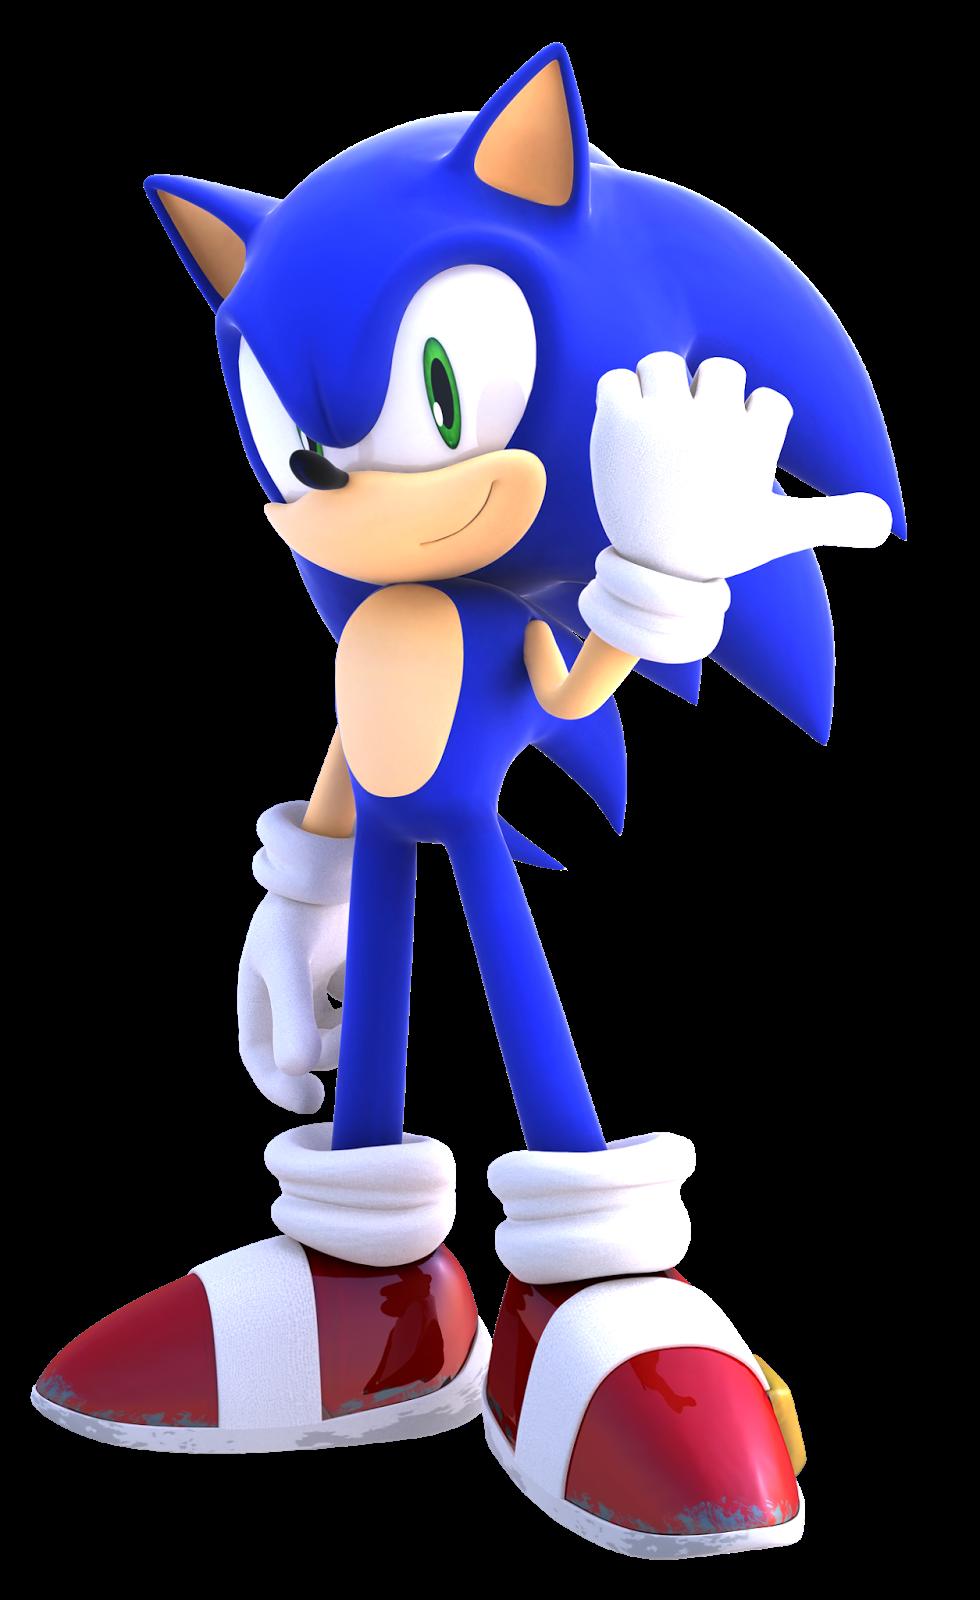 sonic the hedgehog - photo #12